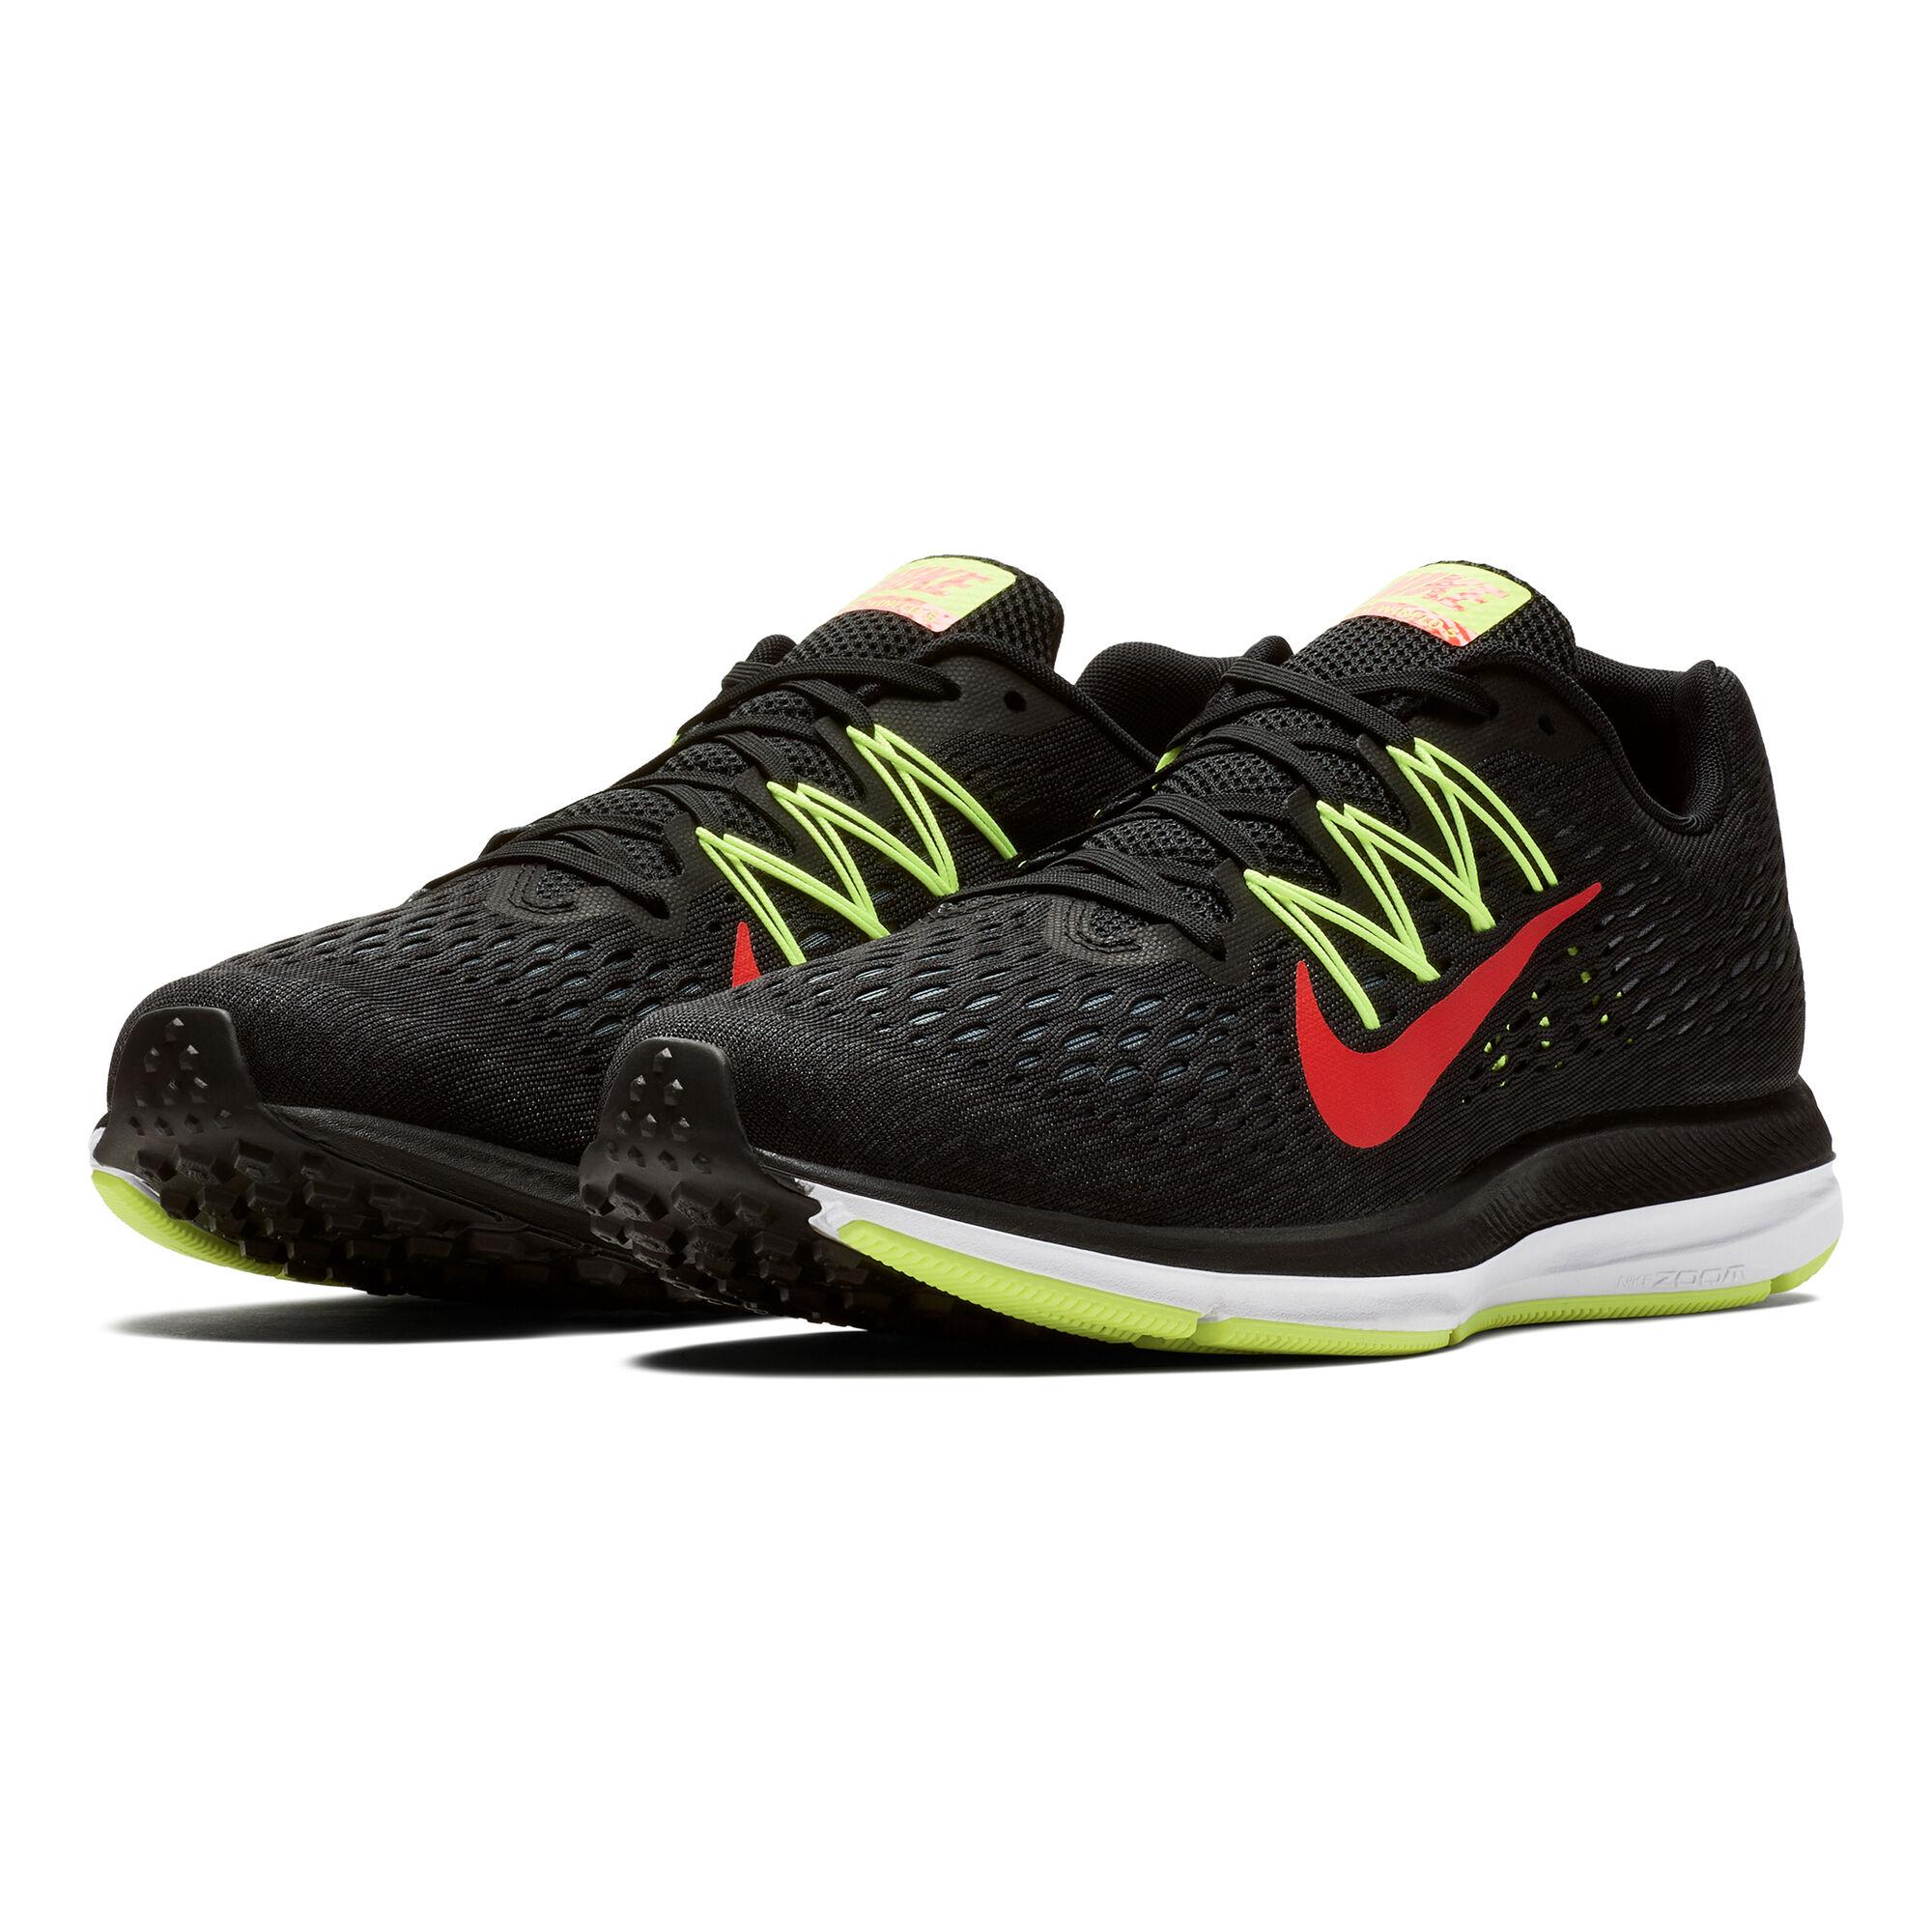 quality design 48089 06c50 buy Nike Zoom Winflo 5 Men - Black, Neon Green online ...